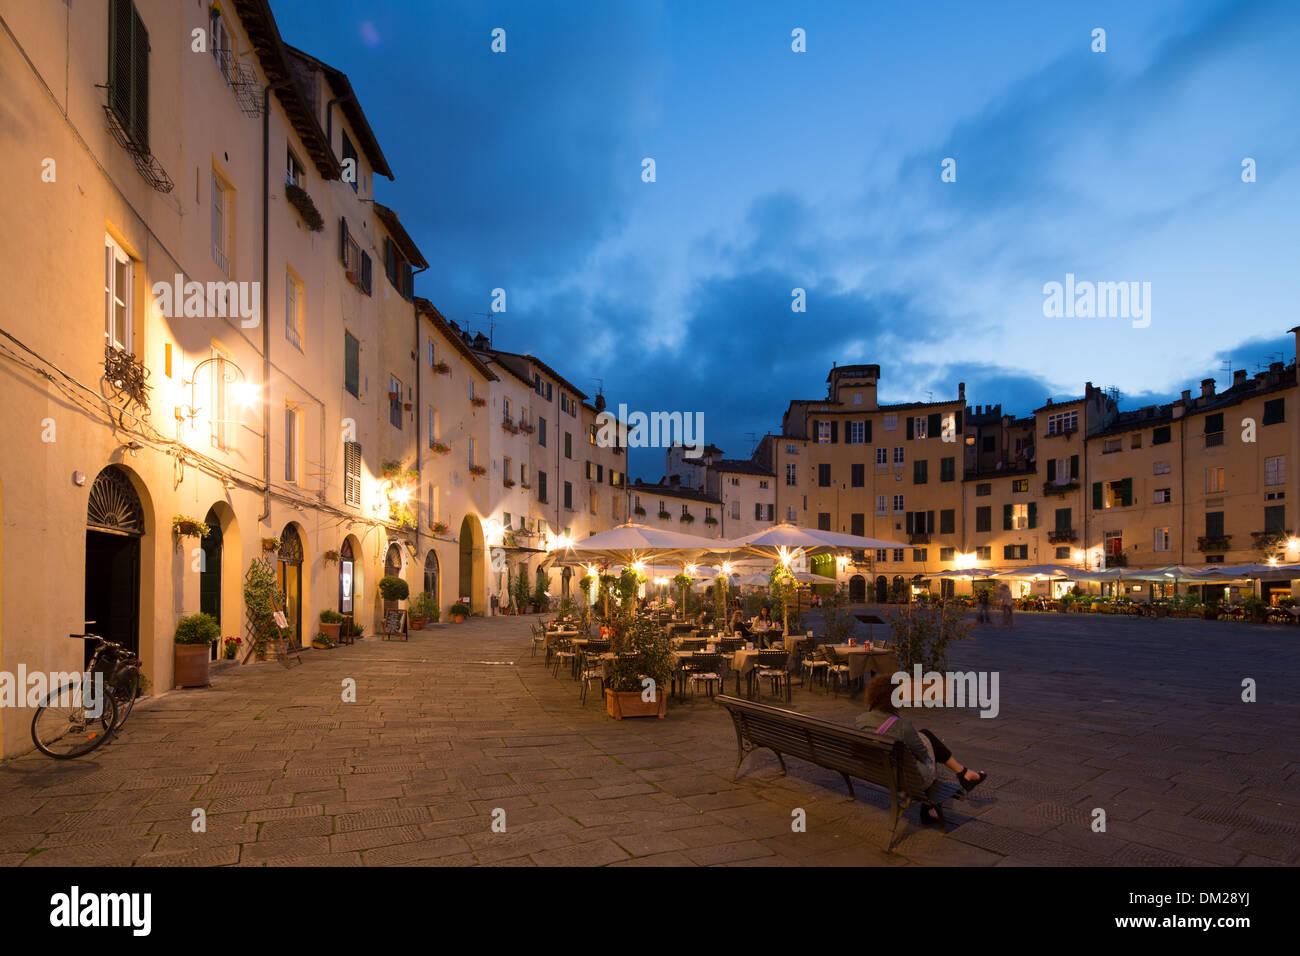 Piazza dell'Anfiteatro, Lucca, Tuscany - Stock Image